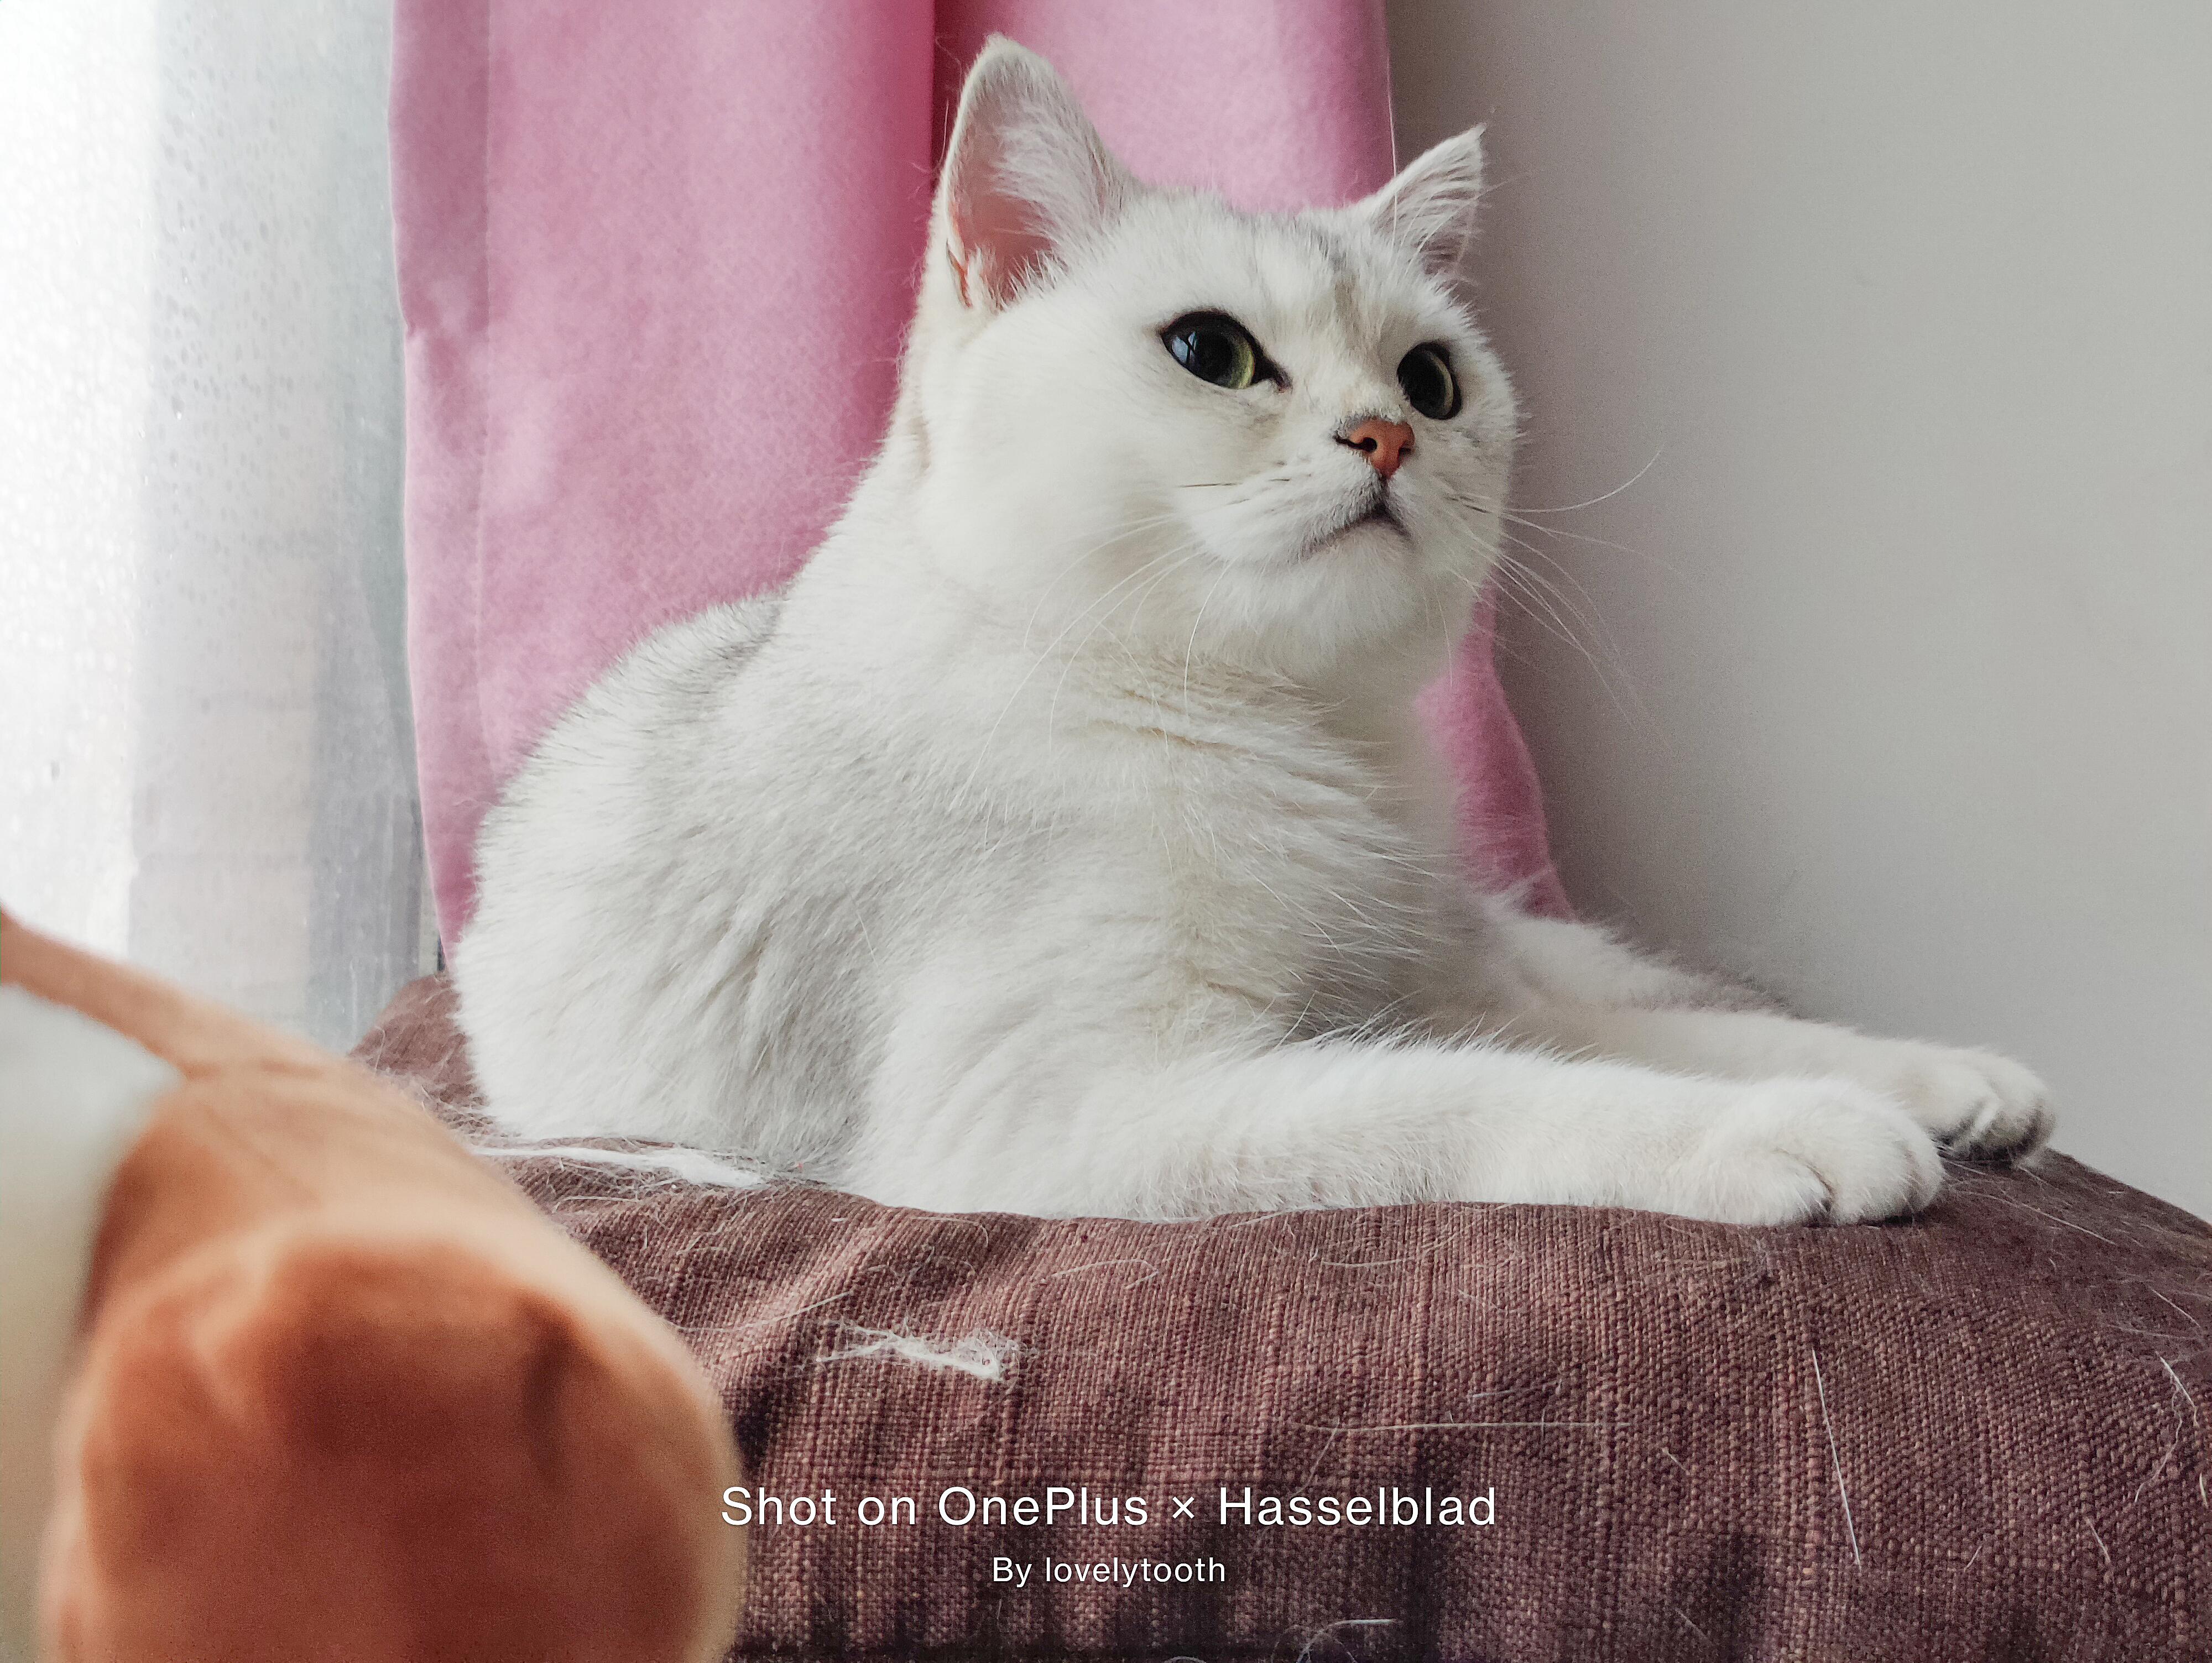 OnePlus9系列拍猫-4.jpg